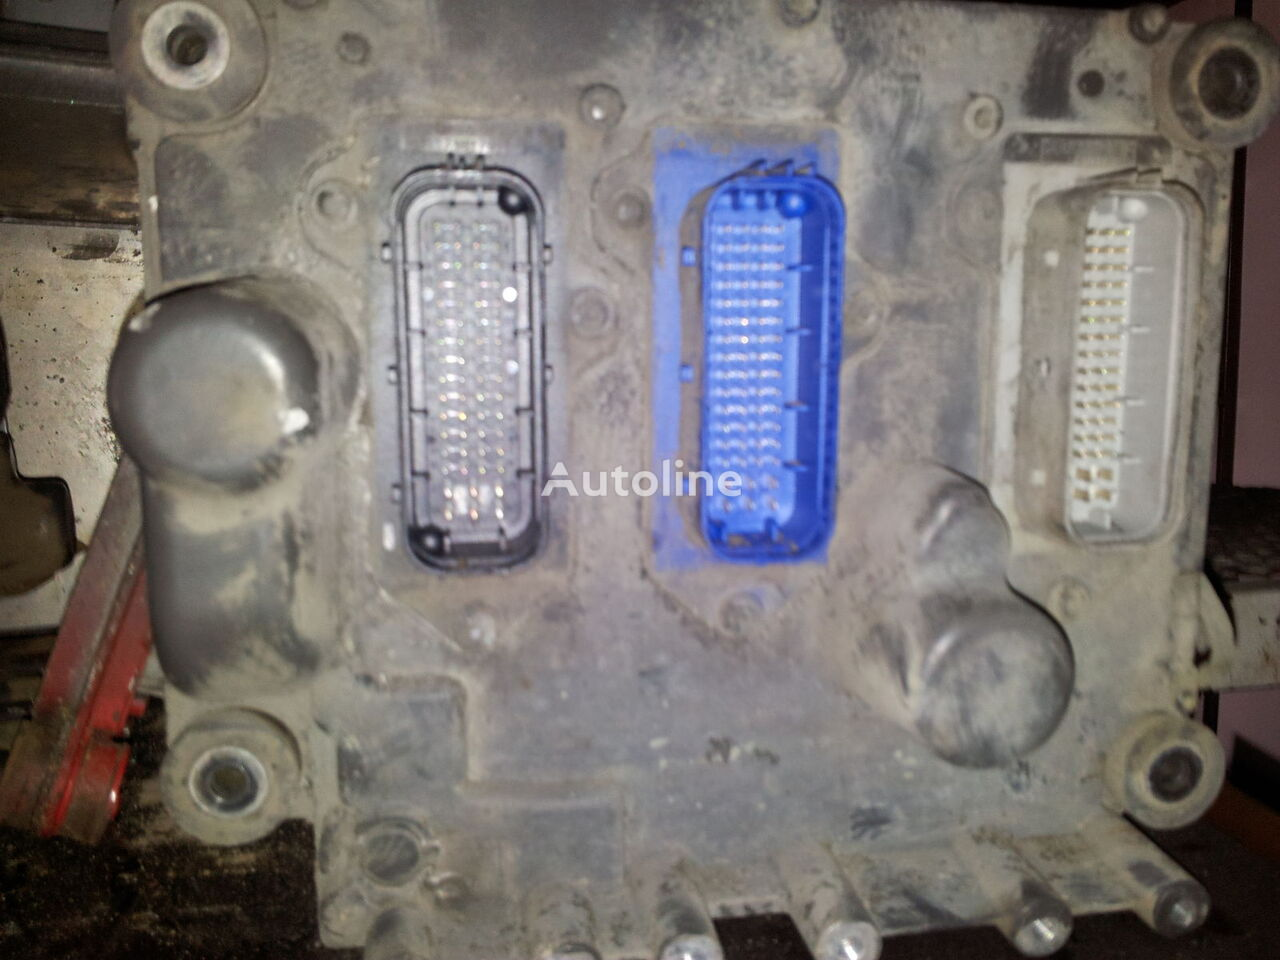 DAF 105XF EURO5 electronic control unit ECU EDC engine managment, engine control unit, DMCI 1679021; 1684367, 1664539, 1679021, 1684367, 1887331 besturingseenheid voor DAF 105XF trekker